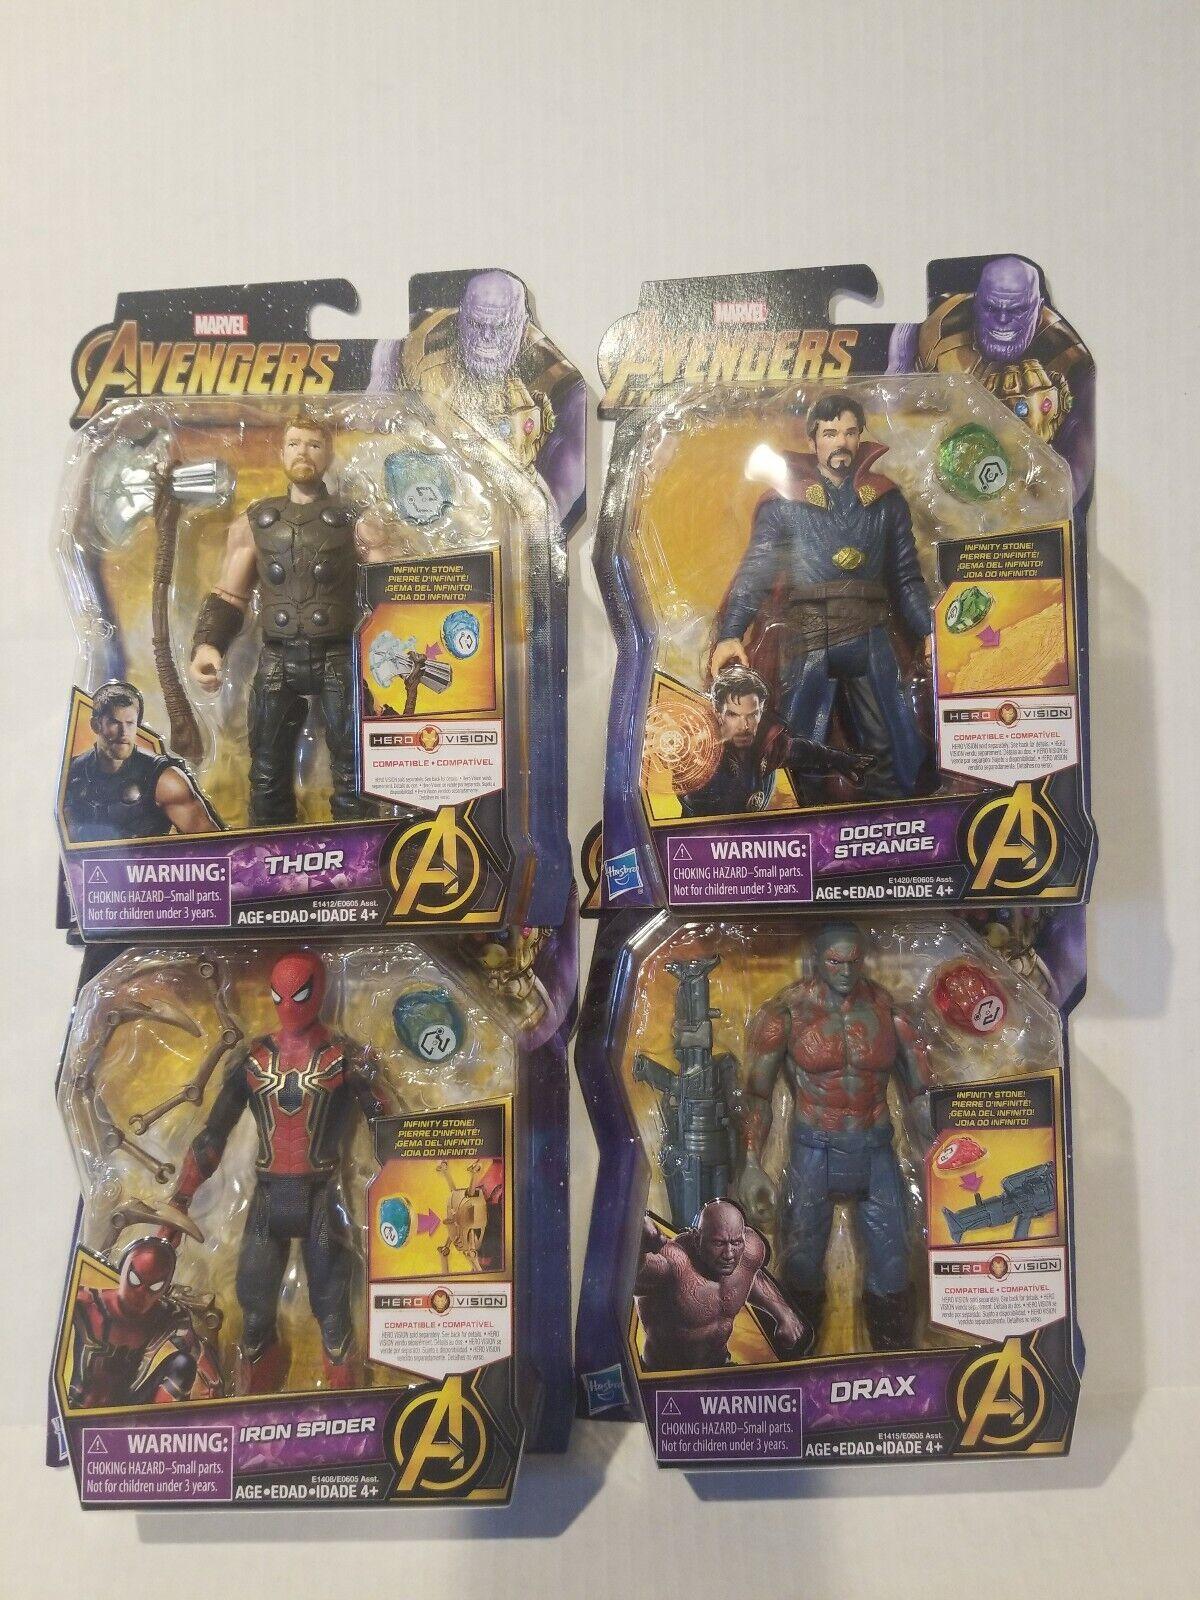 Lot of 4 AVENGERS INFINITY WAR cifras Thor, Captain America, Iron uomo - Hasbro